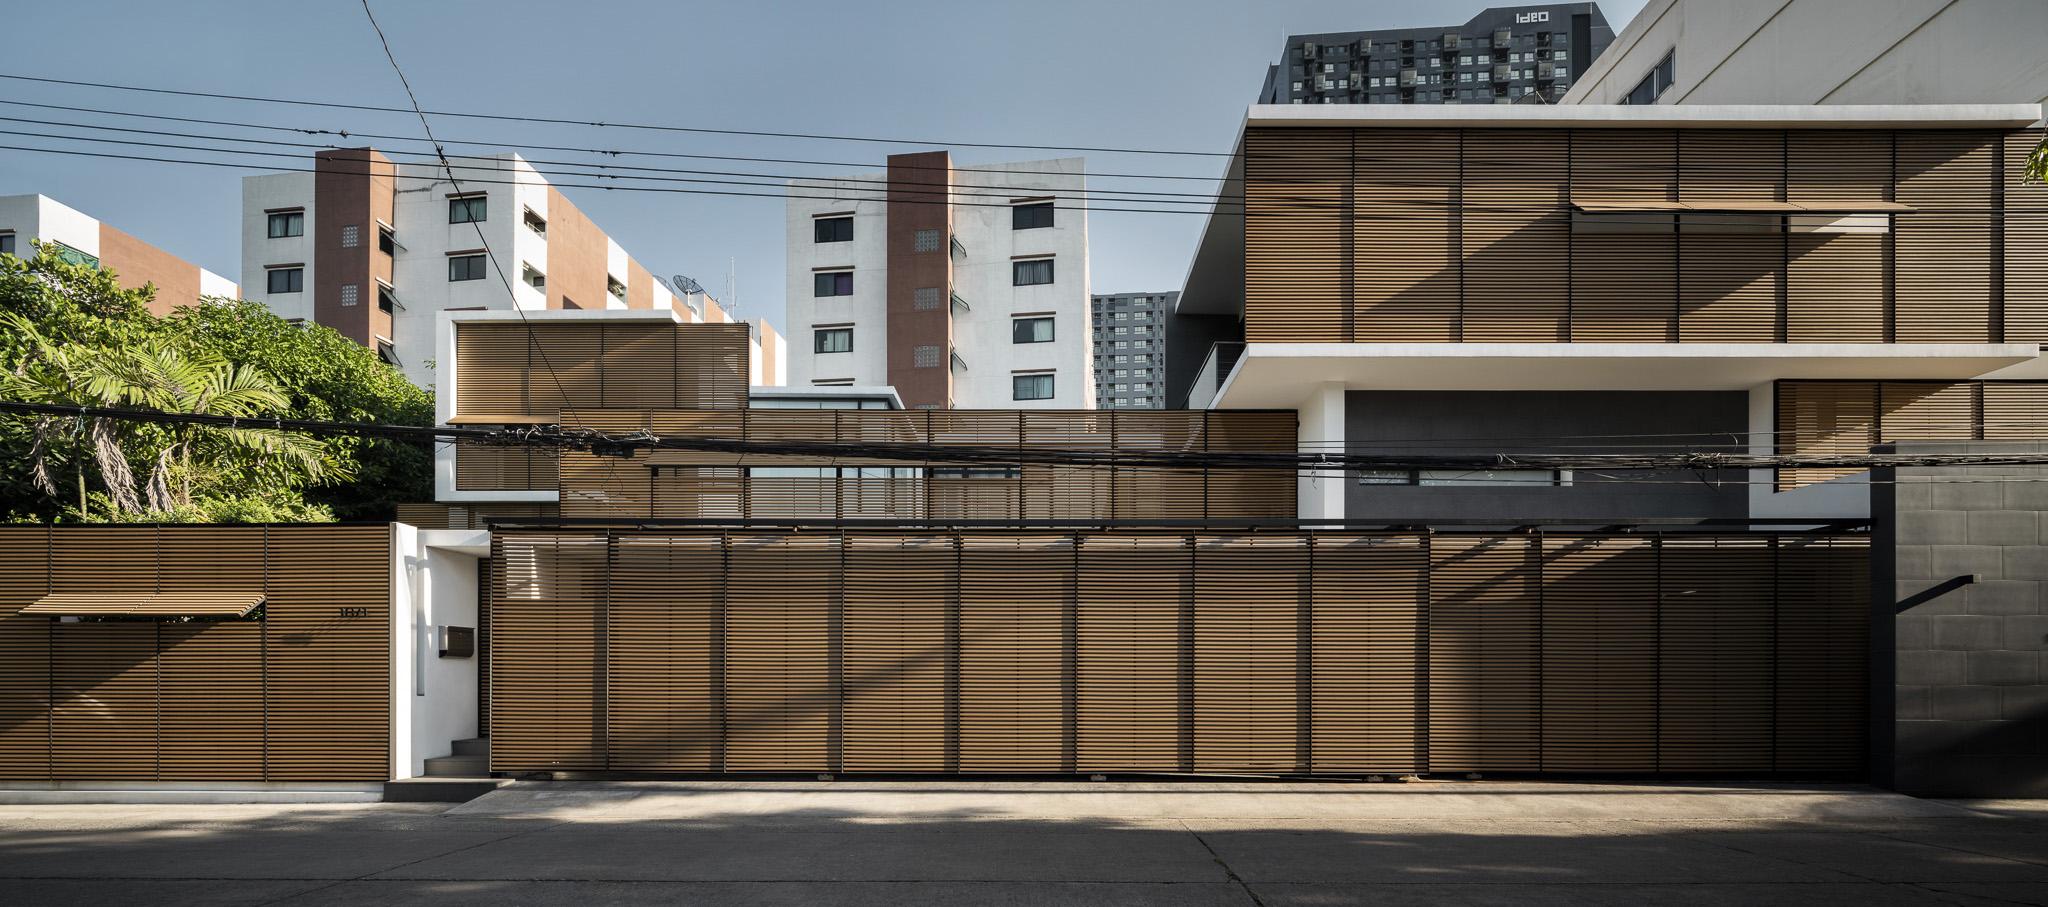 Vivienda Sukhumvit 91 por Archimontage Design Fields Sophisticated. Fotografía por Chalermwat Wongchompoo